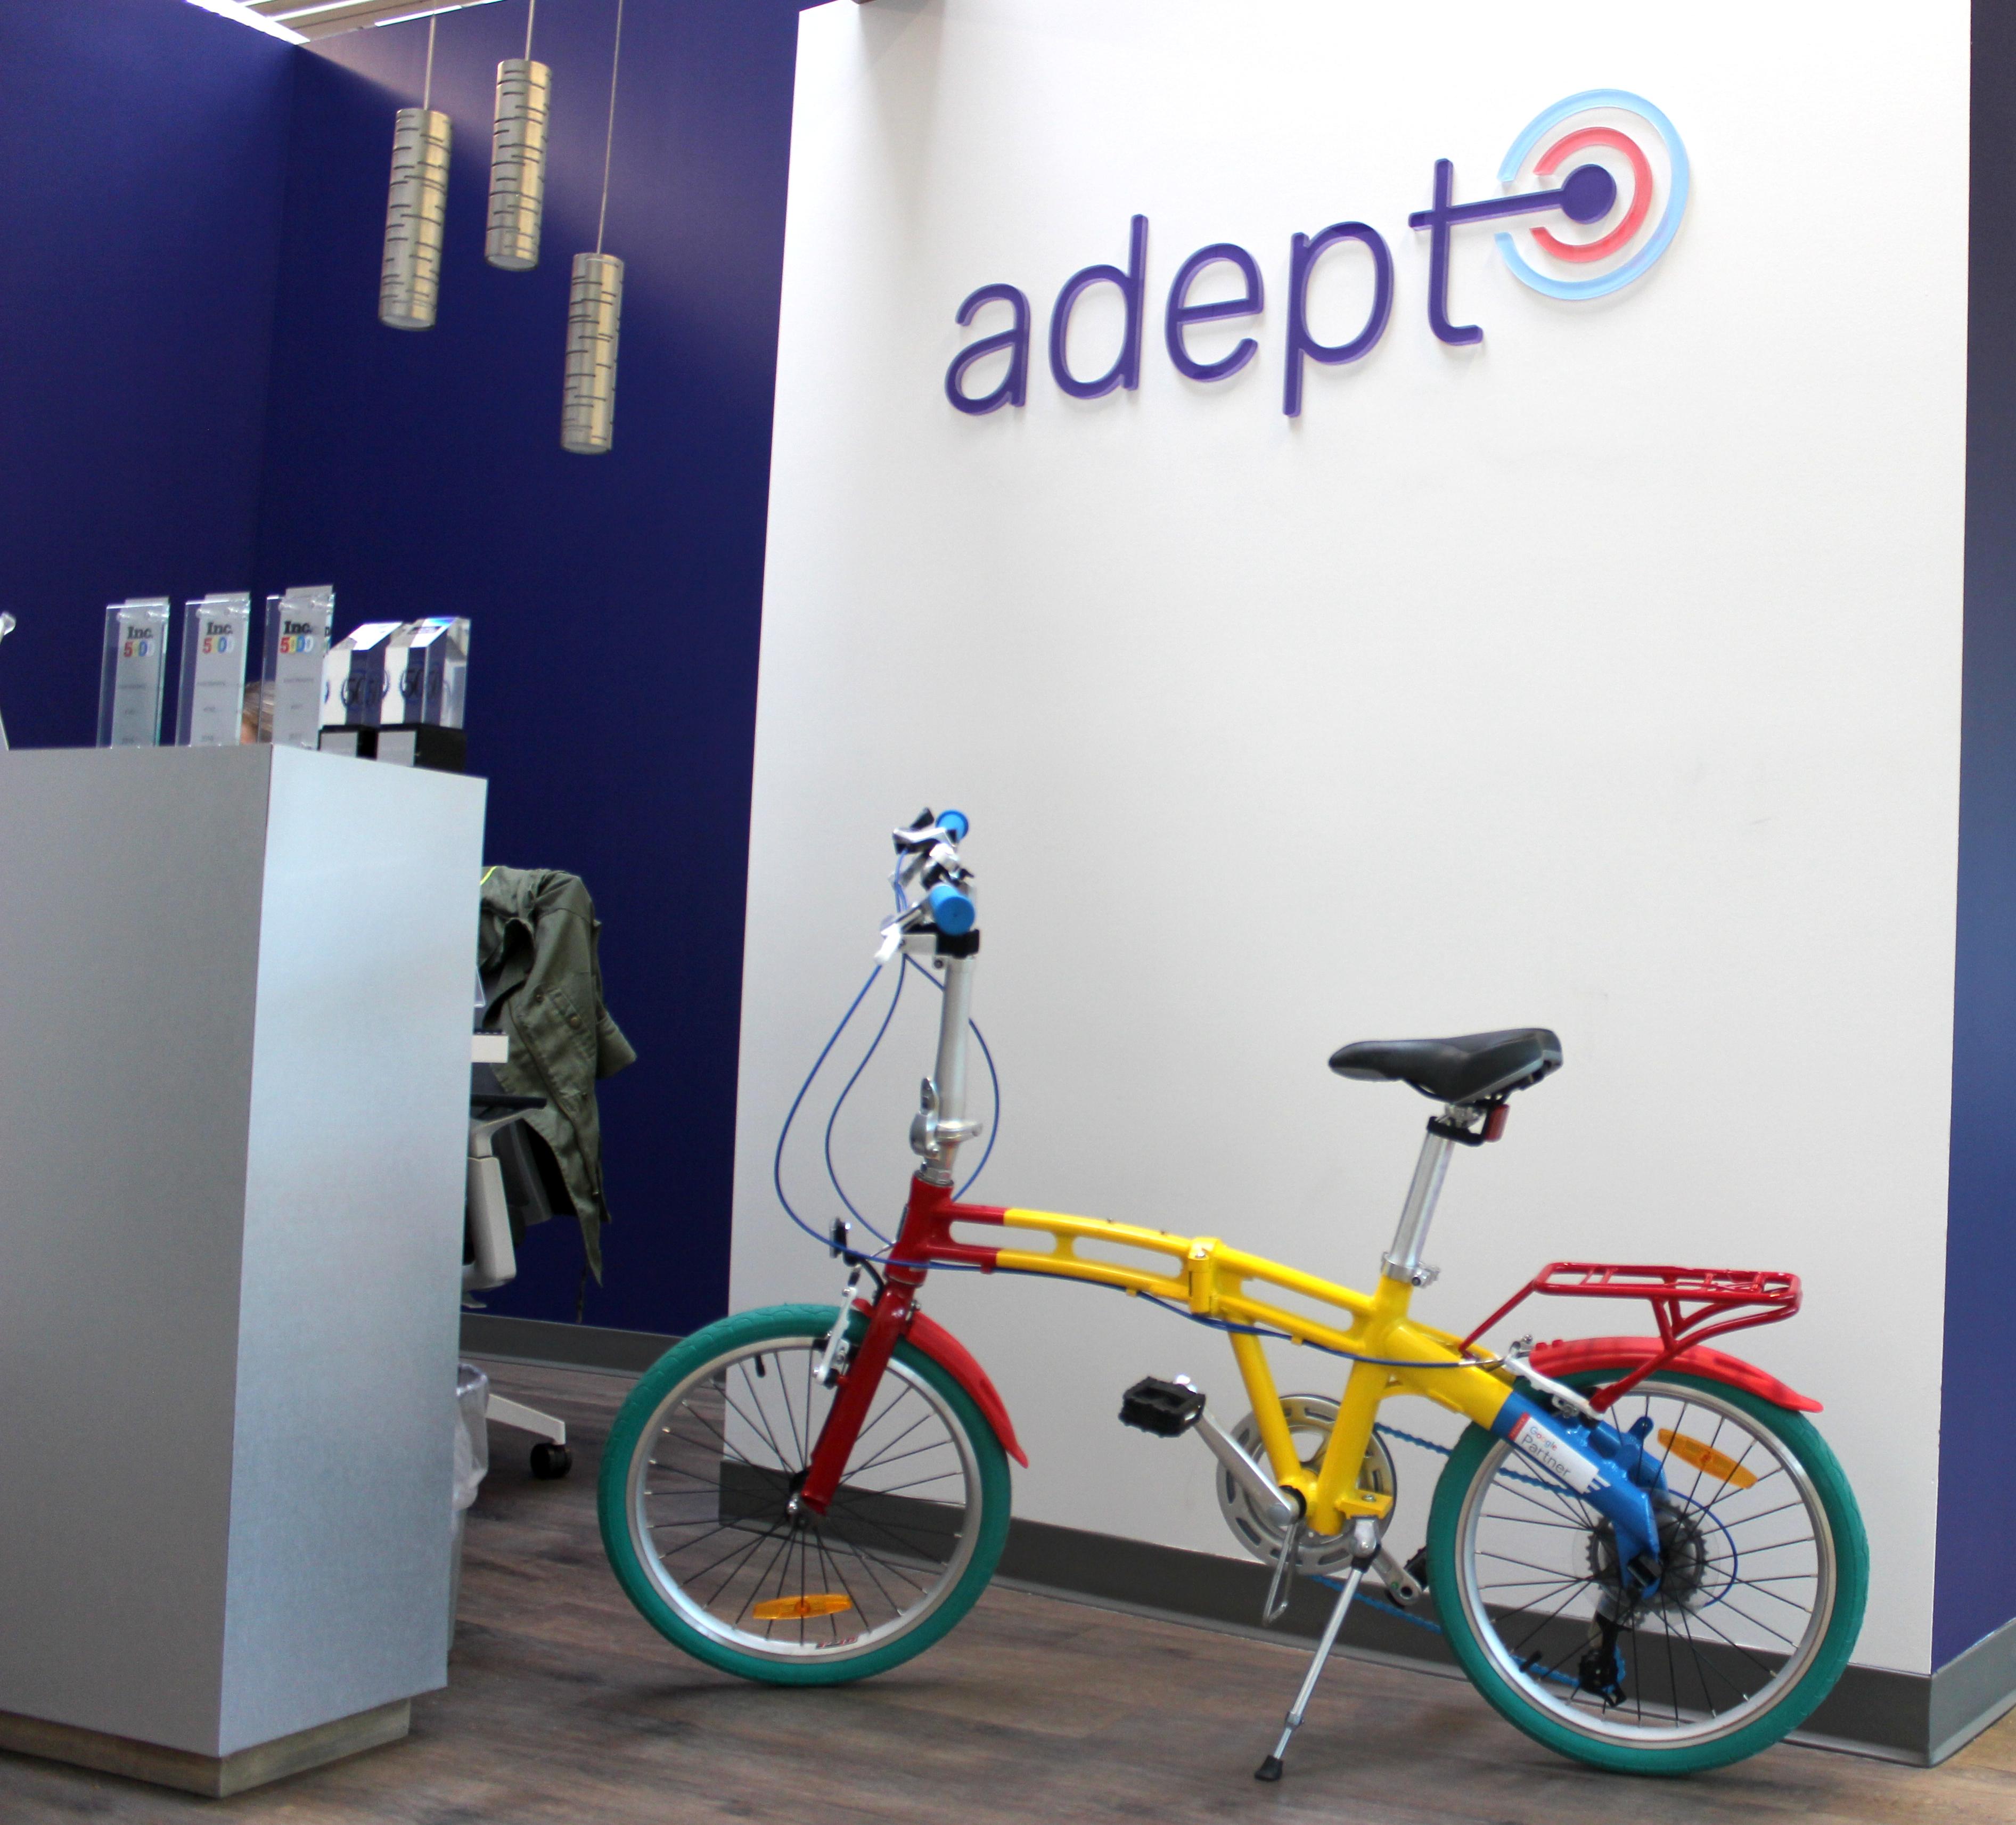 google bike in adept lobby